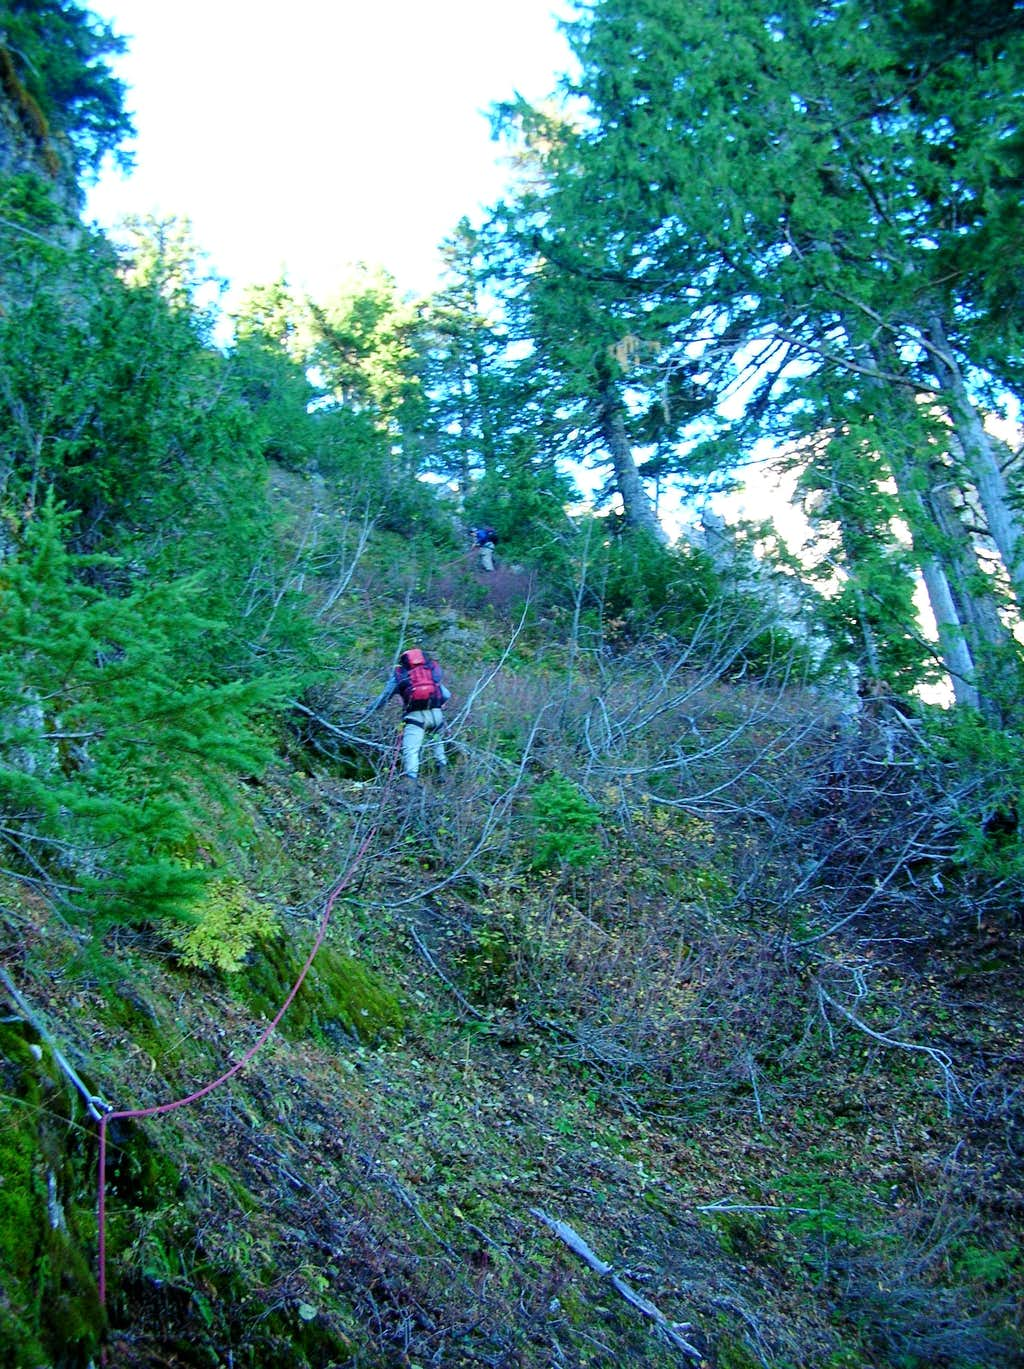 Climbing up to the ridge